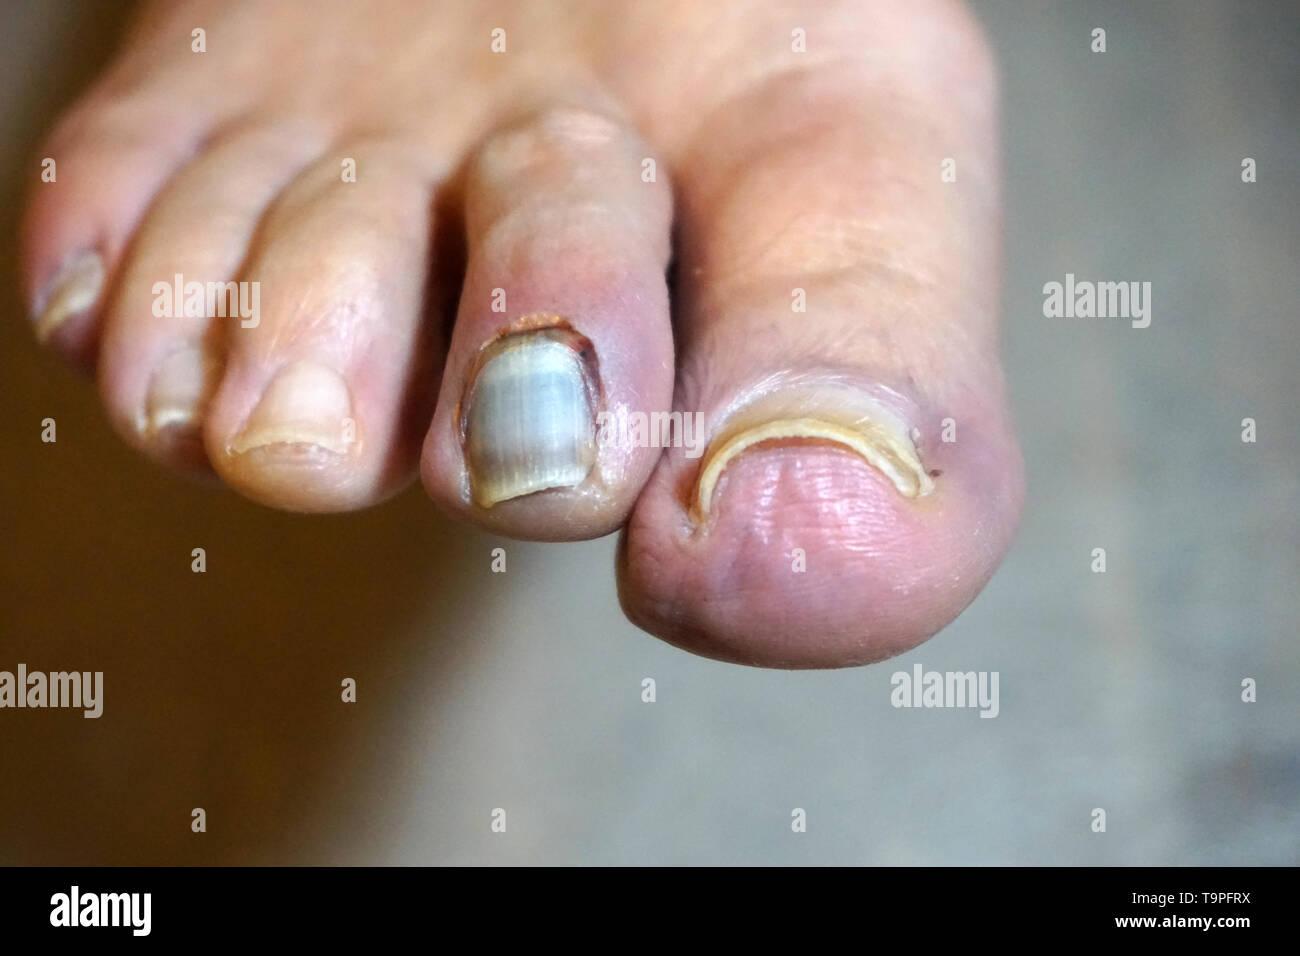 Fußzeh gebrochener VIDEO: Großer